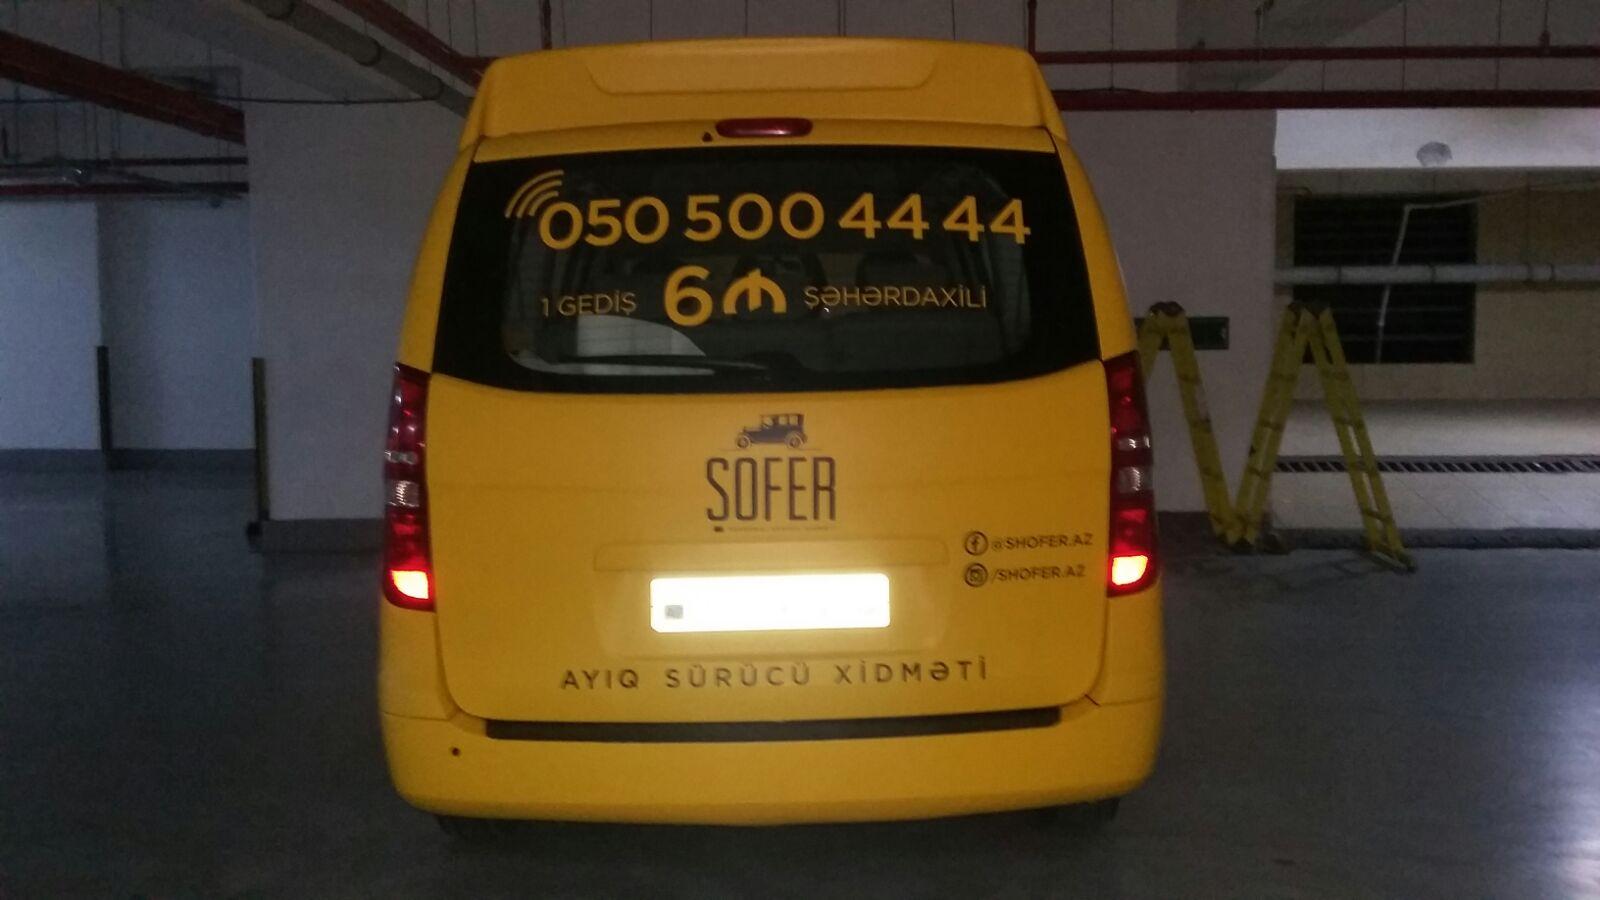 avtomobil uzerinde reklam montaj